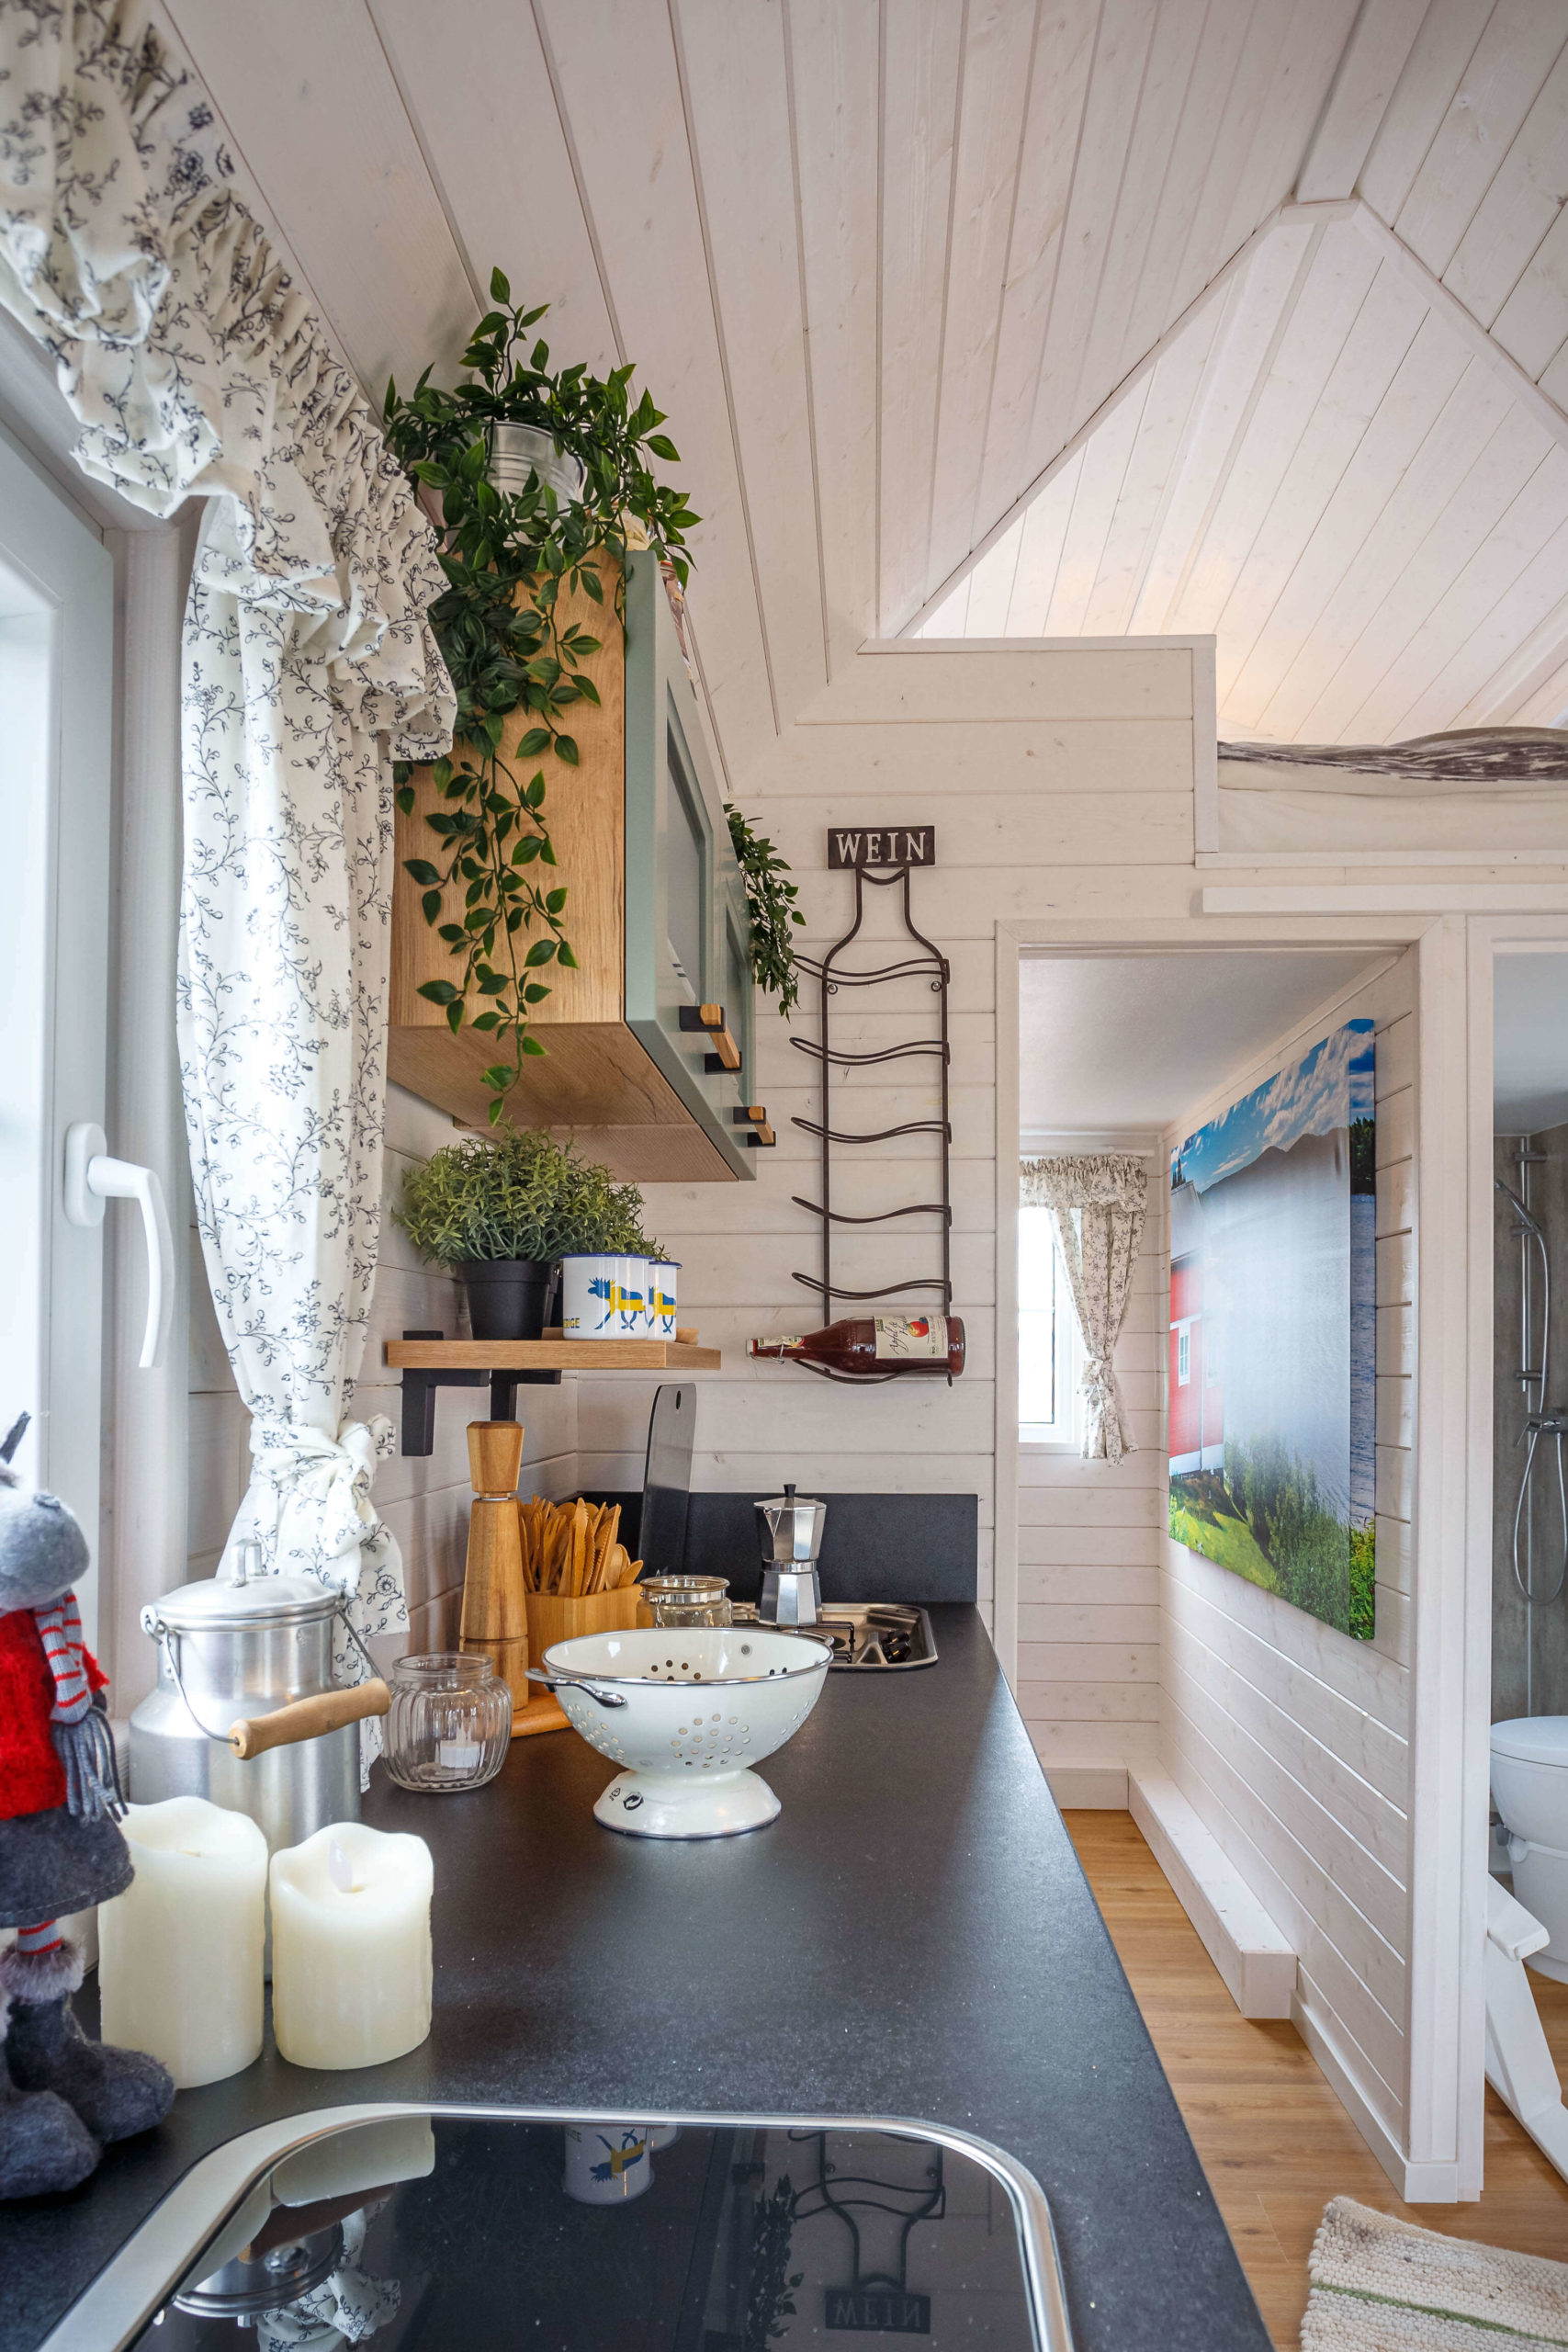 mobiles-tiny-house-schweden-vital-camp-gmbh-23